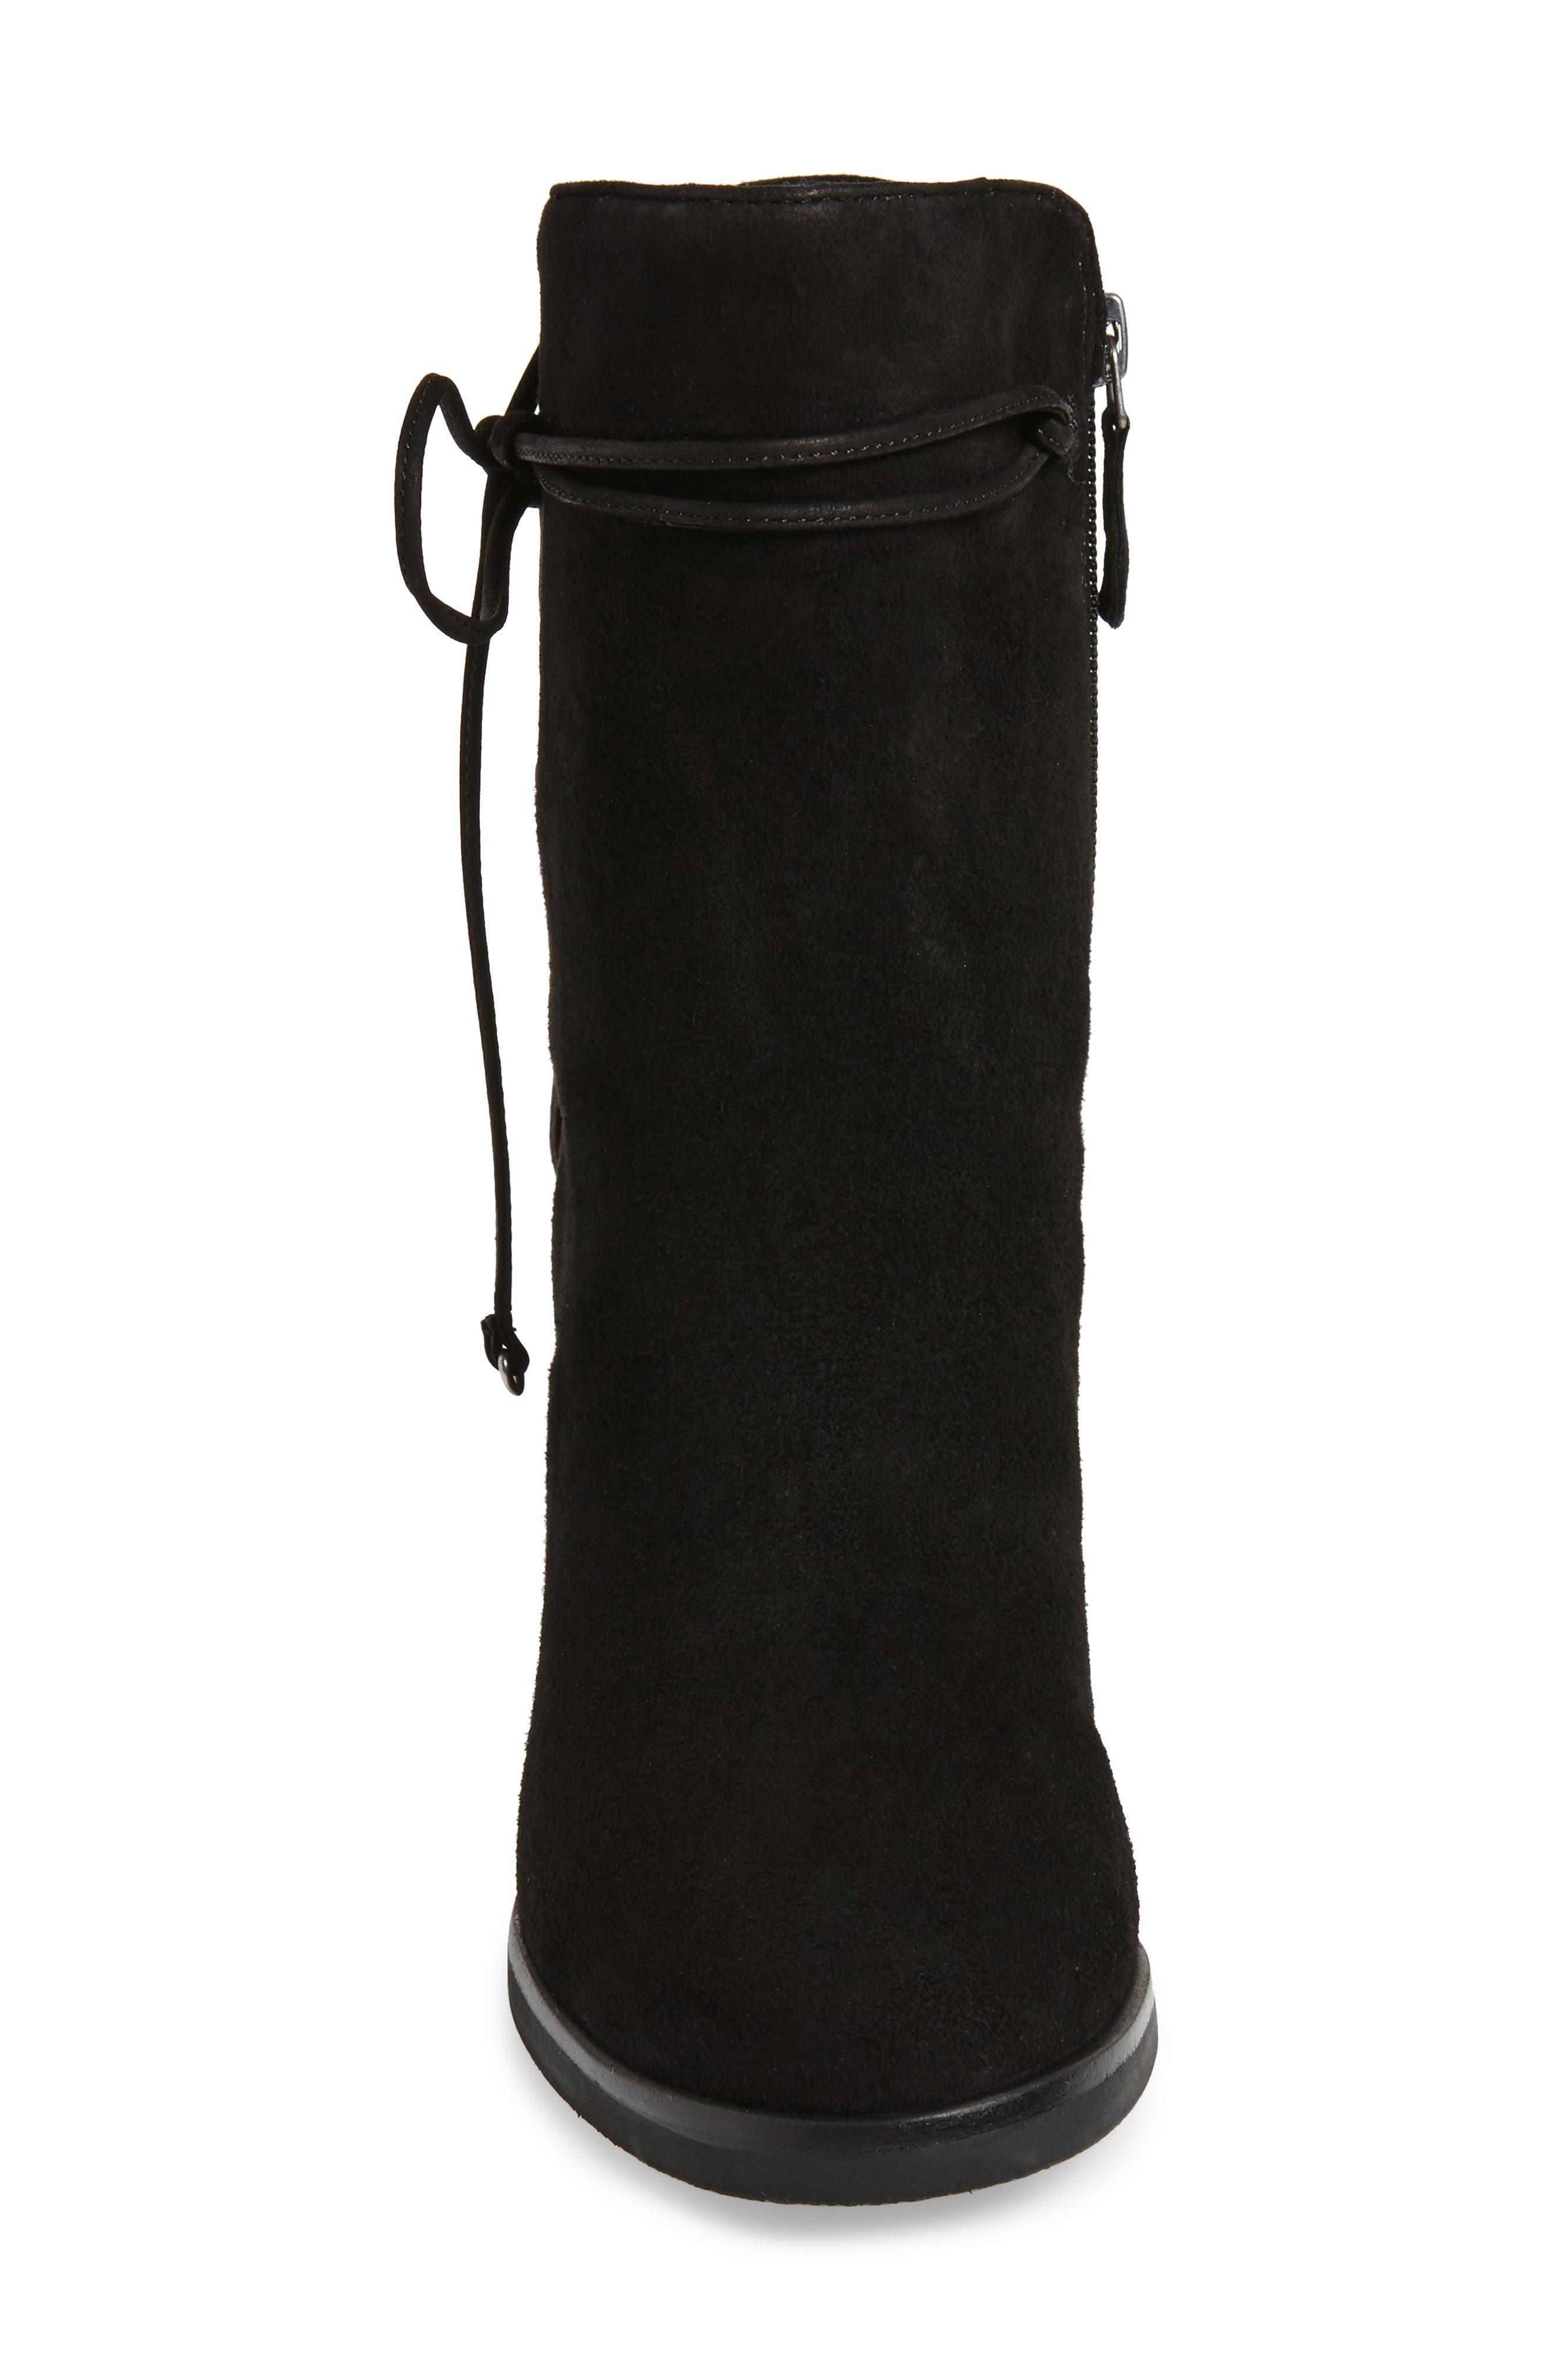 Adley Ankle Wrap Boot,                             Alternate thumbnail 4, color,                             Black Suede